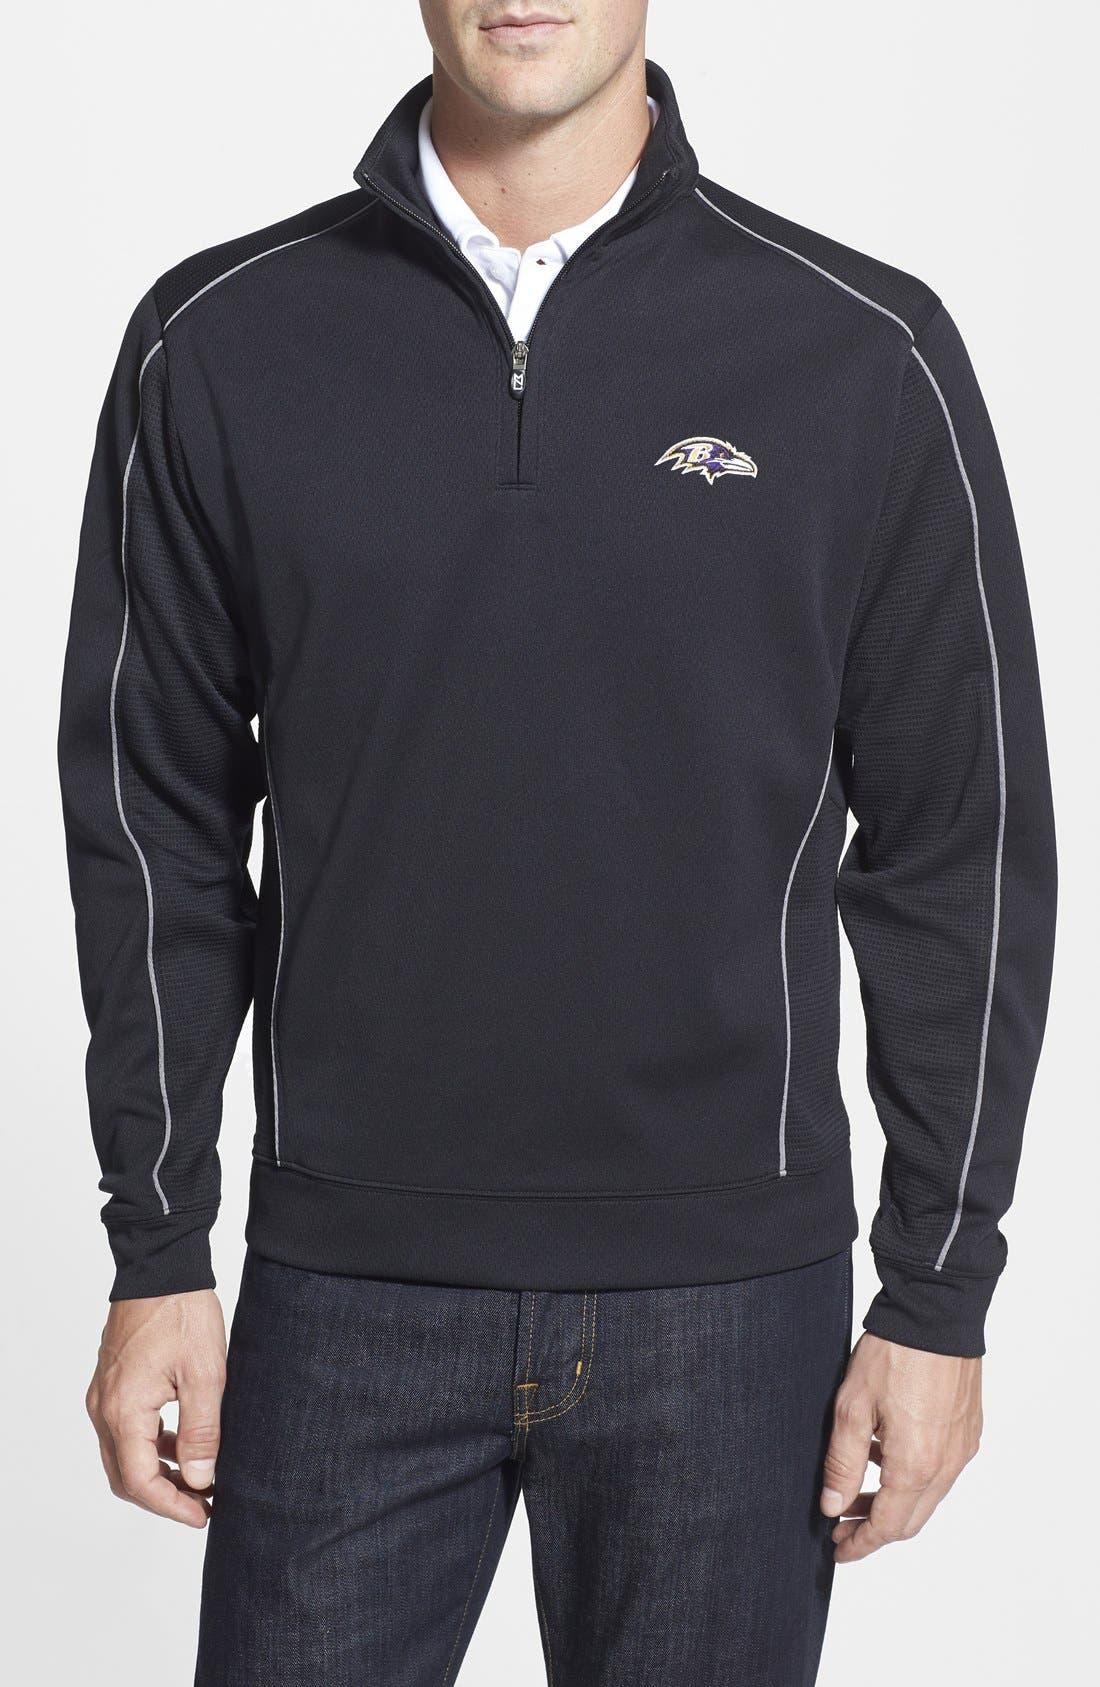 Baltimore Ravens - Edge DryTec Moisture Wicking Half Zip Pullover,                             Main thumbnail 1, color,                             001